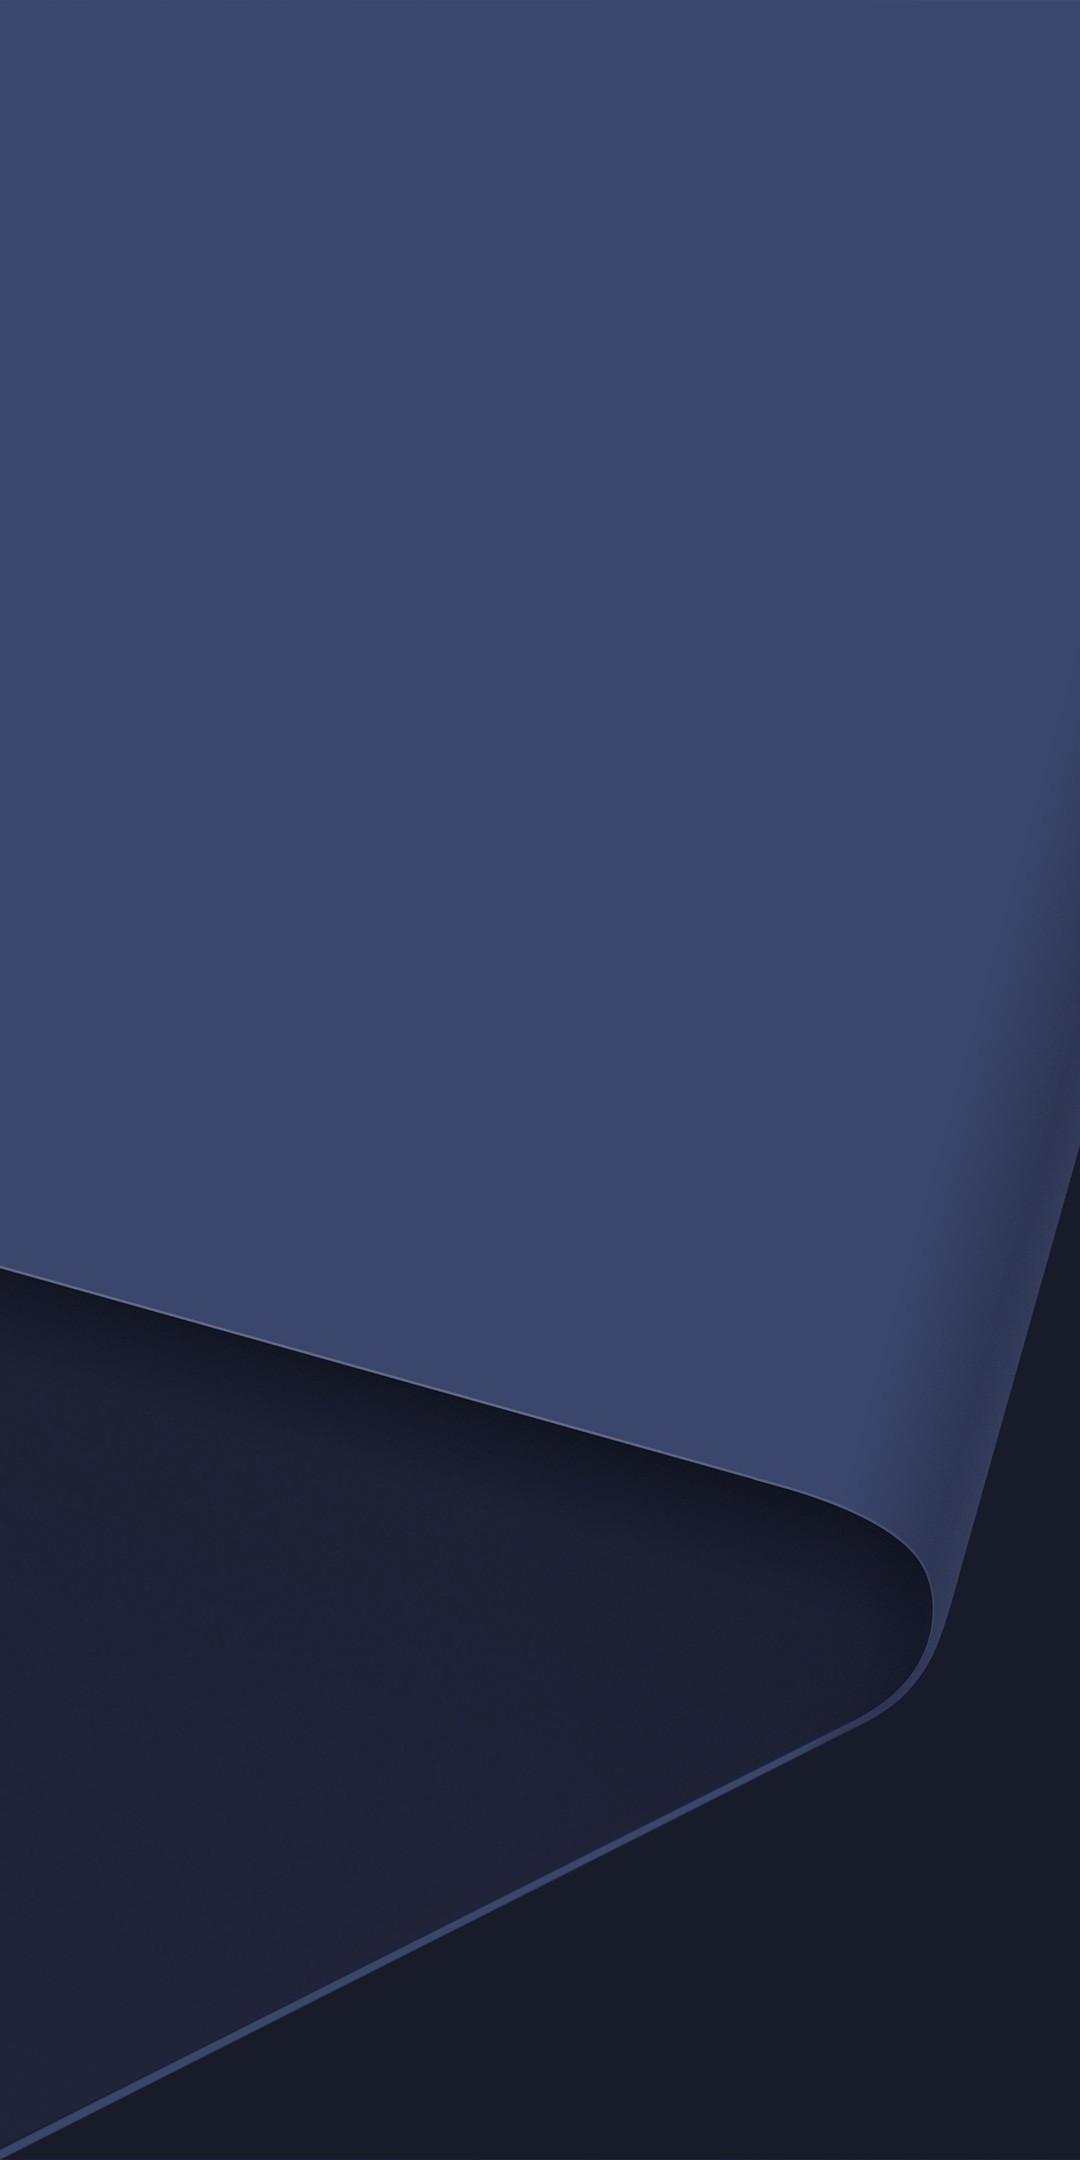 ZTE Blade V9 Stock Wallpaper 09   [1080x2160] 1080x2160